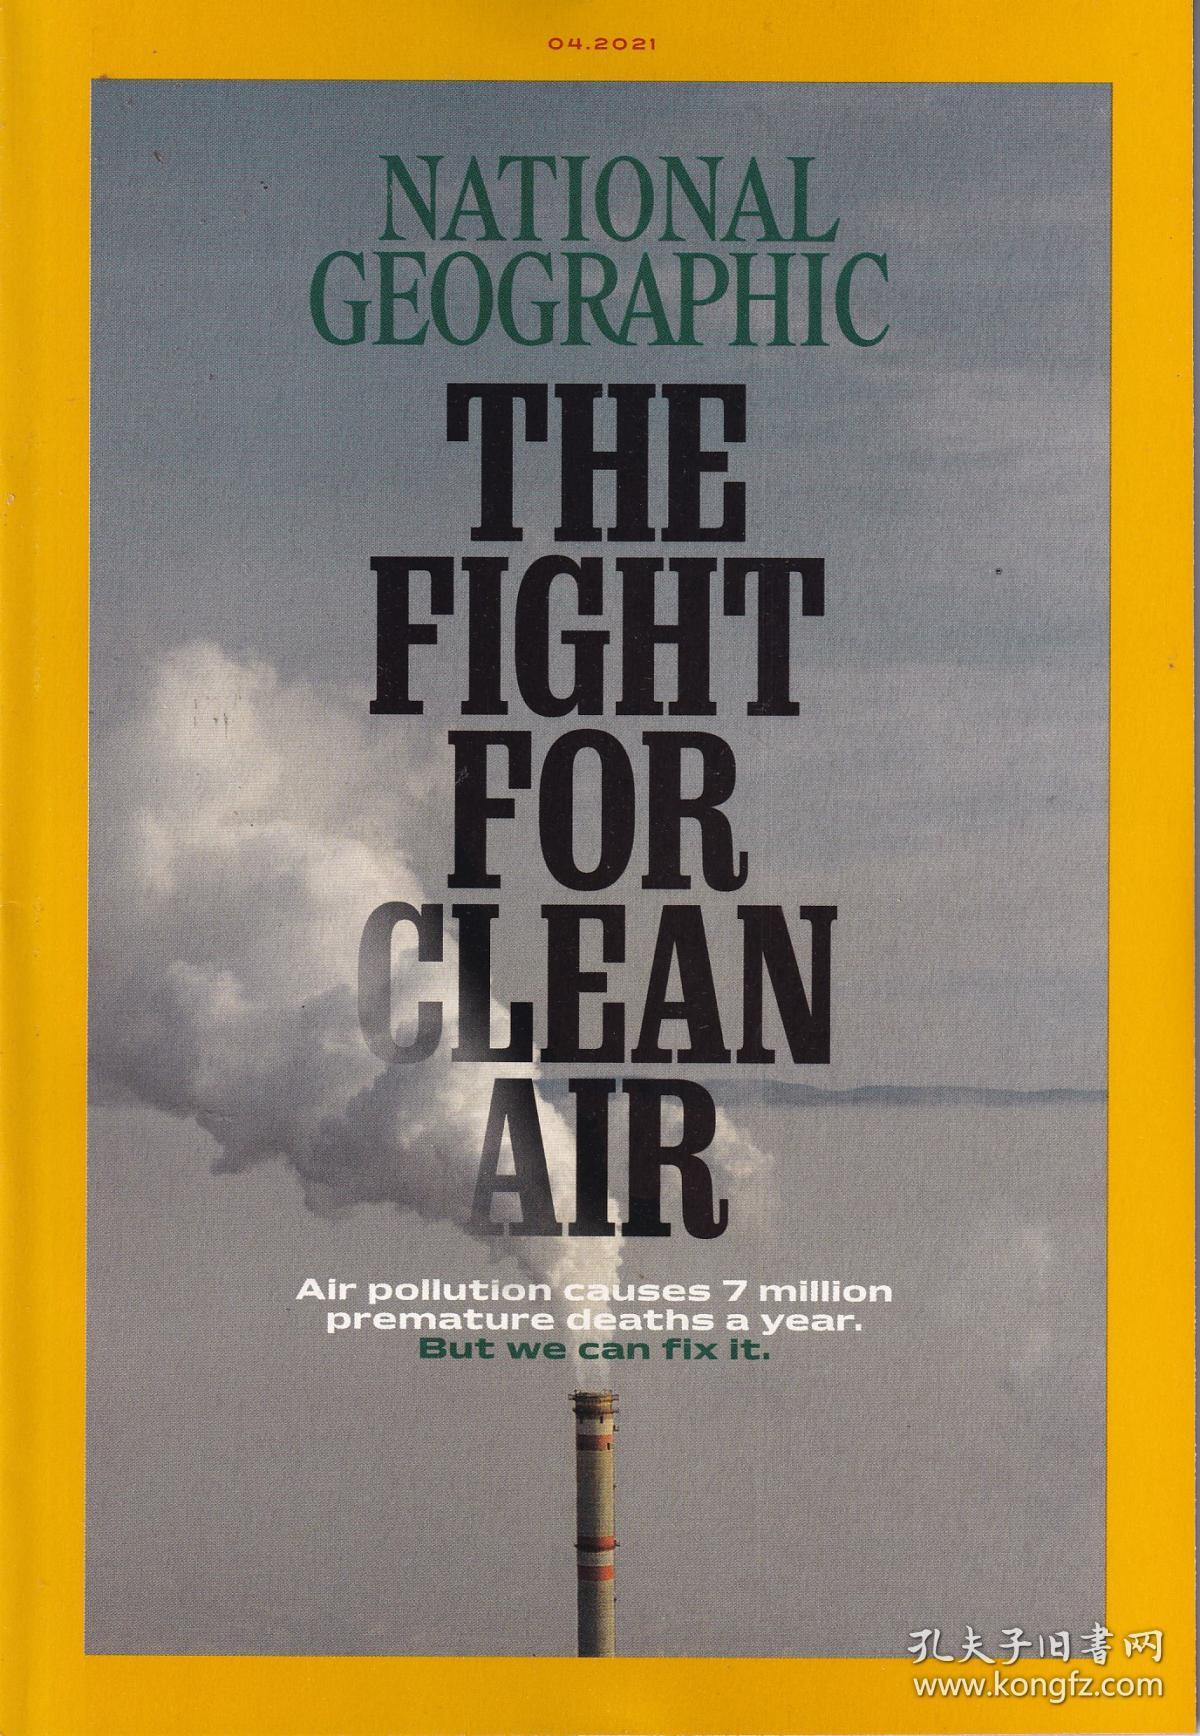 National Geographic 美国国家地理2021年4月 英文版旅游杂志